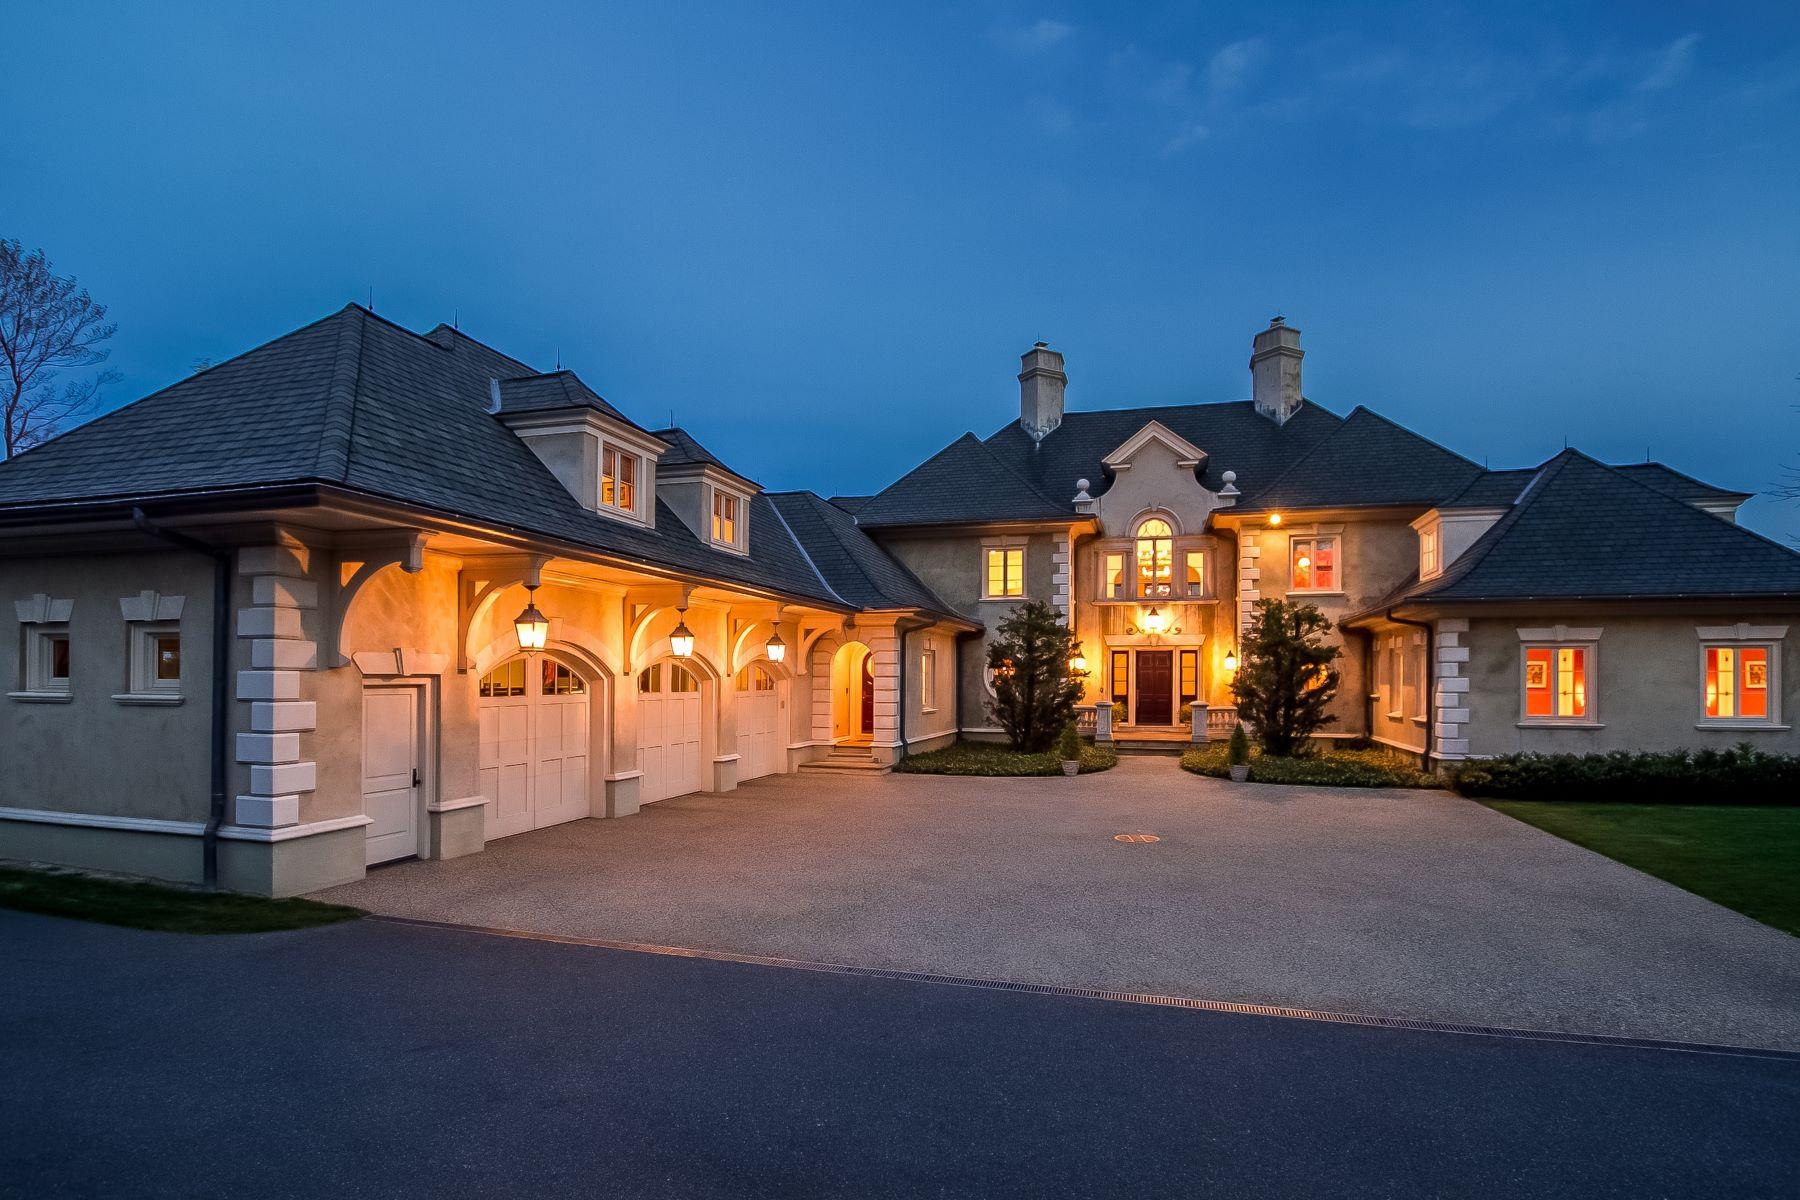 single family homes voor Verkoop op 85 Nayatt Rd, Barrington, RI Barrington, Rhode Island 02806 Verenigde Staten